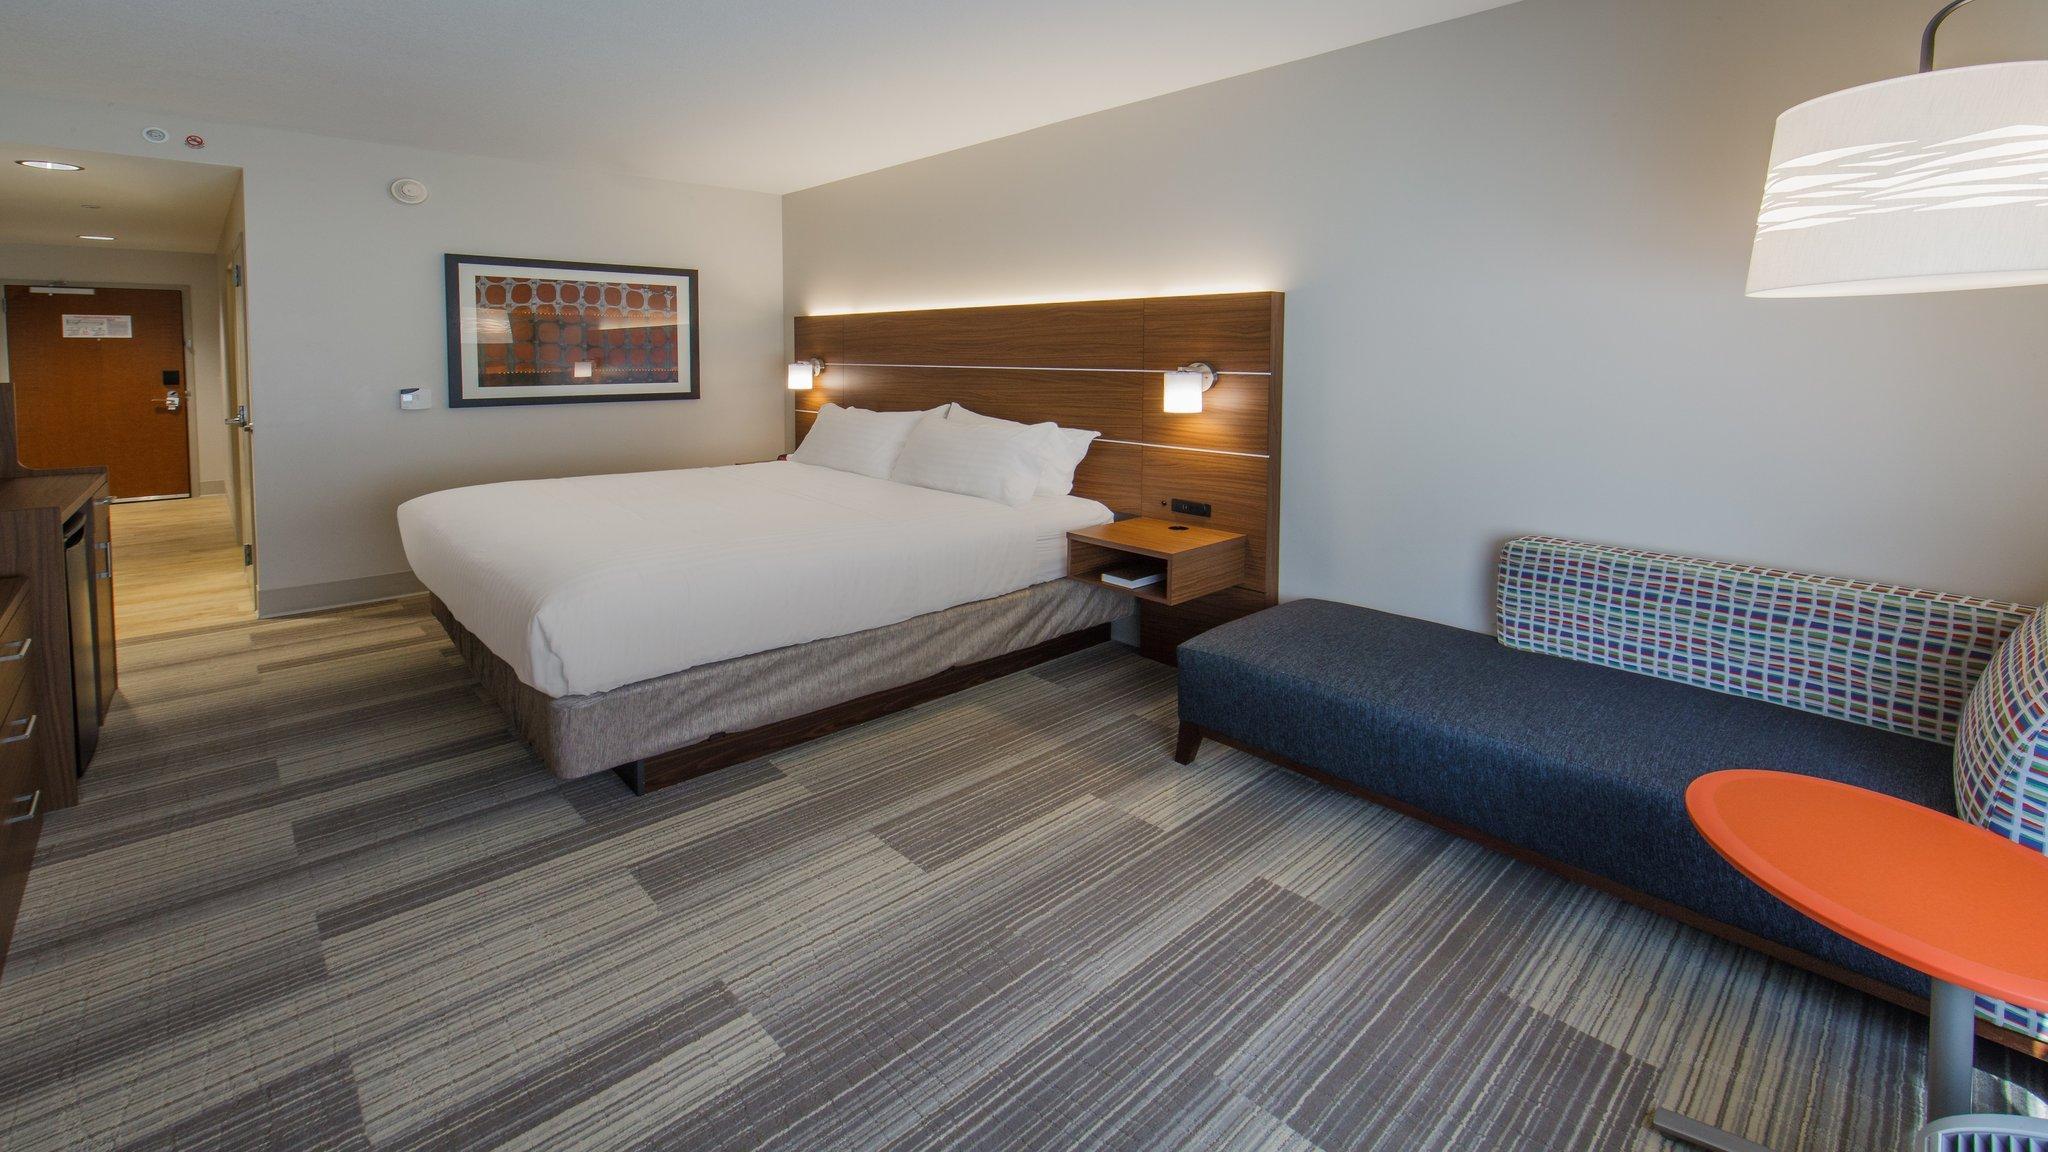 Holiday Inn Express Gatlinburg Downtown Hotel Gatlinburg Tn Deals Photos Reviews